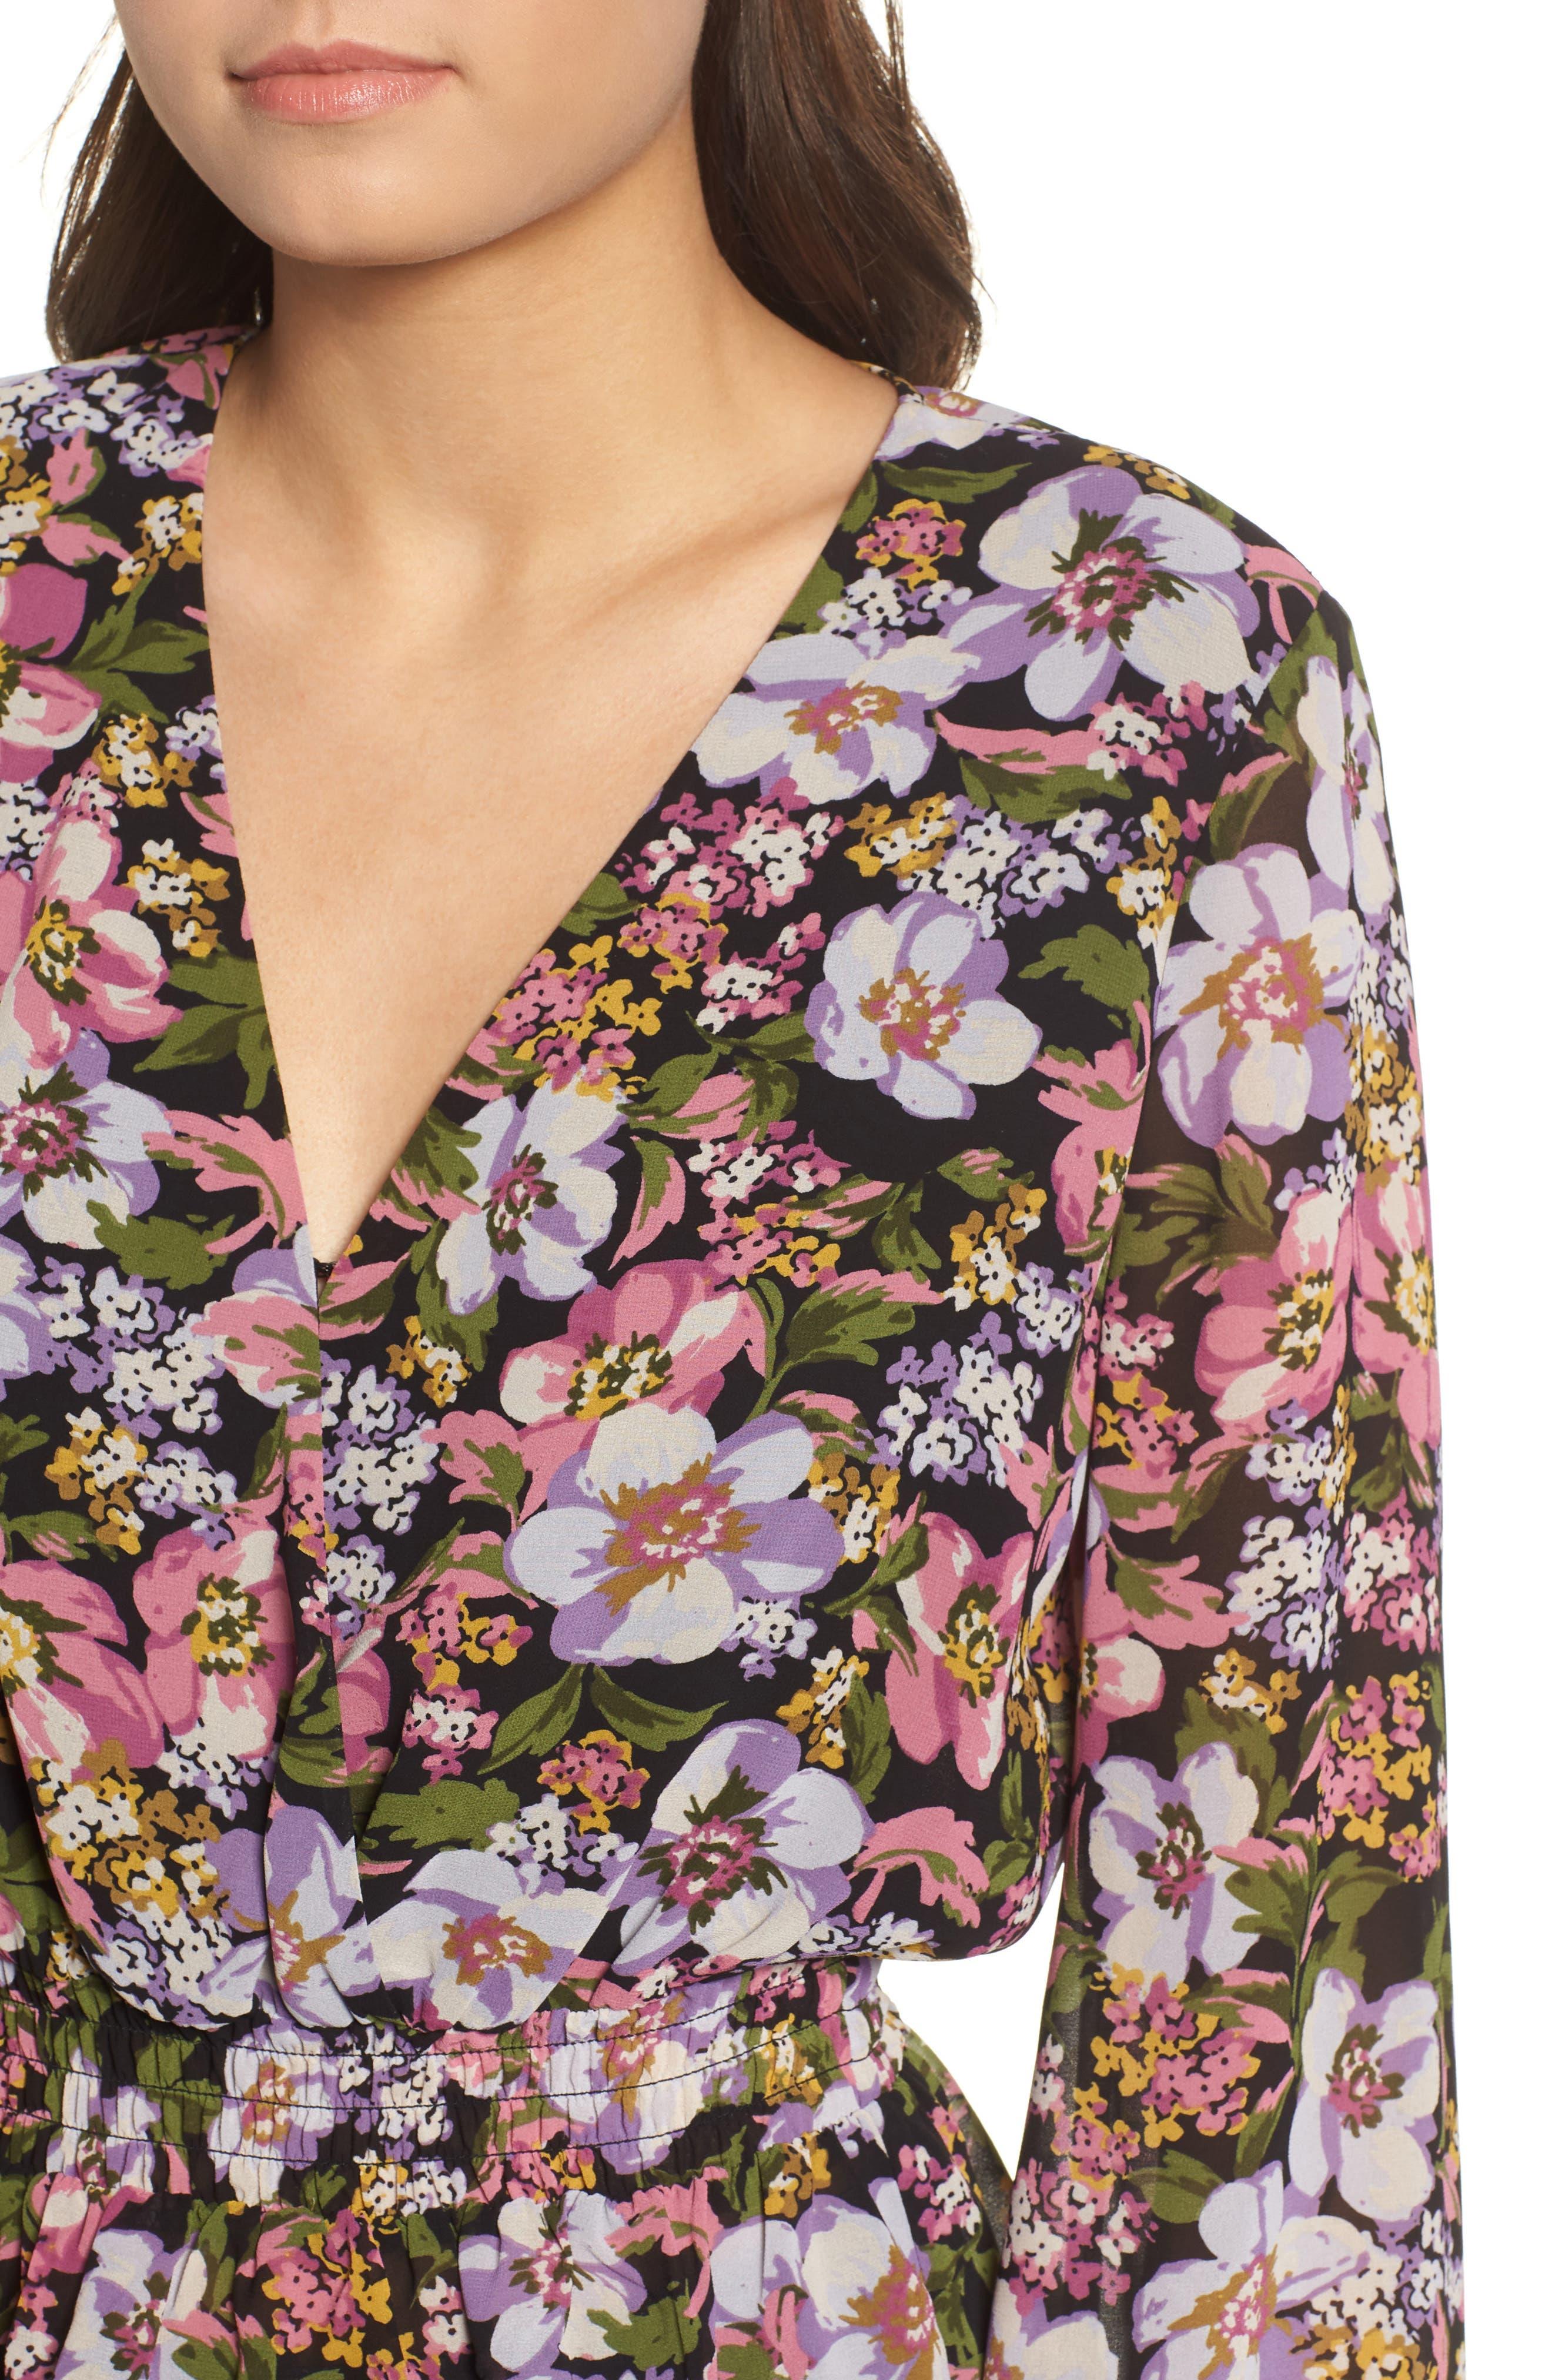 Beth Floral Top,                             Alternate thumbnail 4, color,                             BLACK PETAL FLORAL